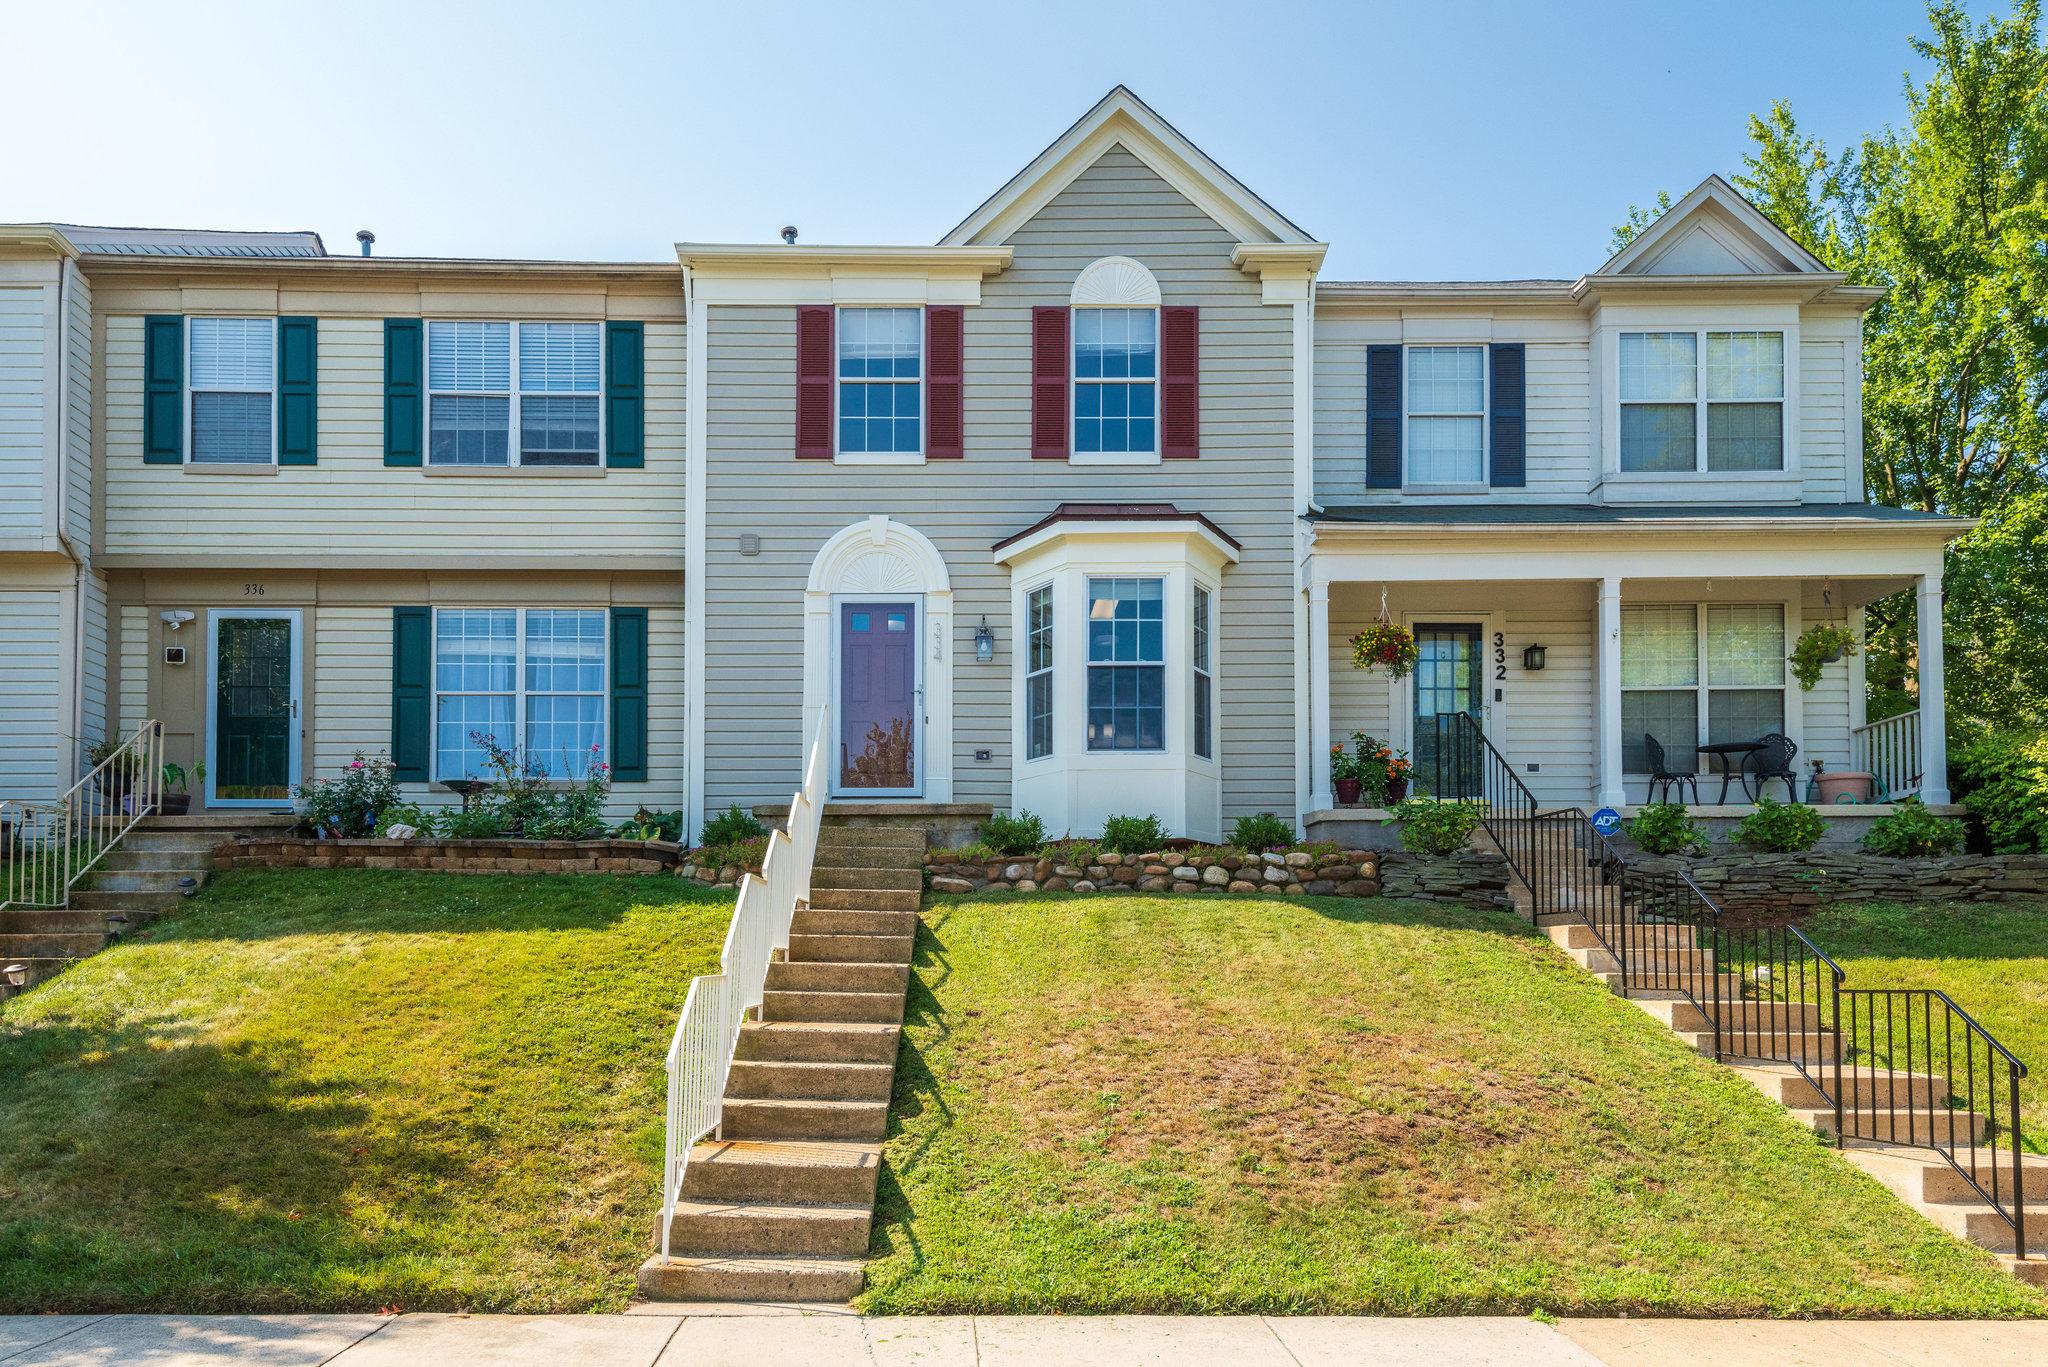 334 Millbrook Ter NE, Leesburg- For Sale